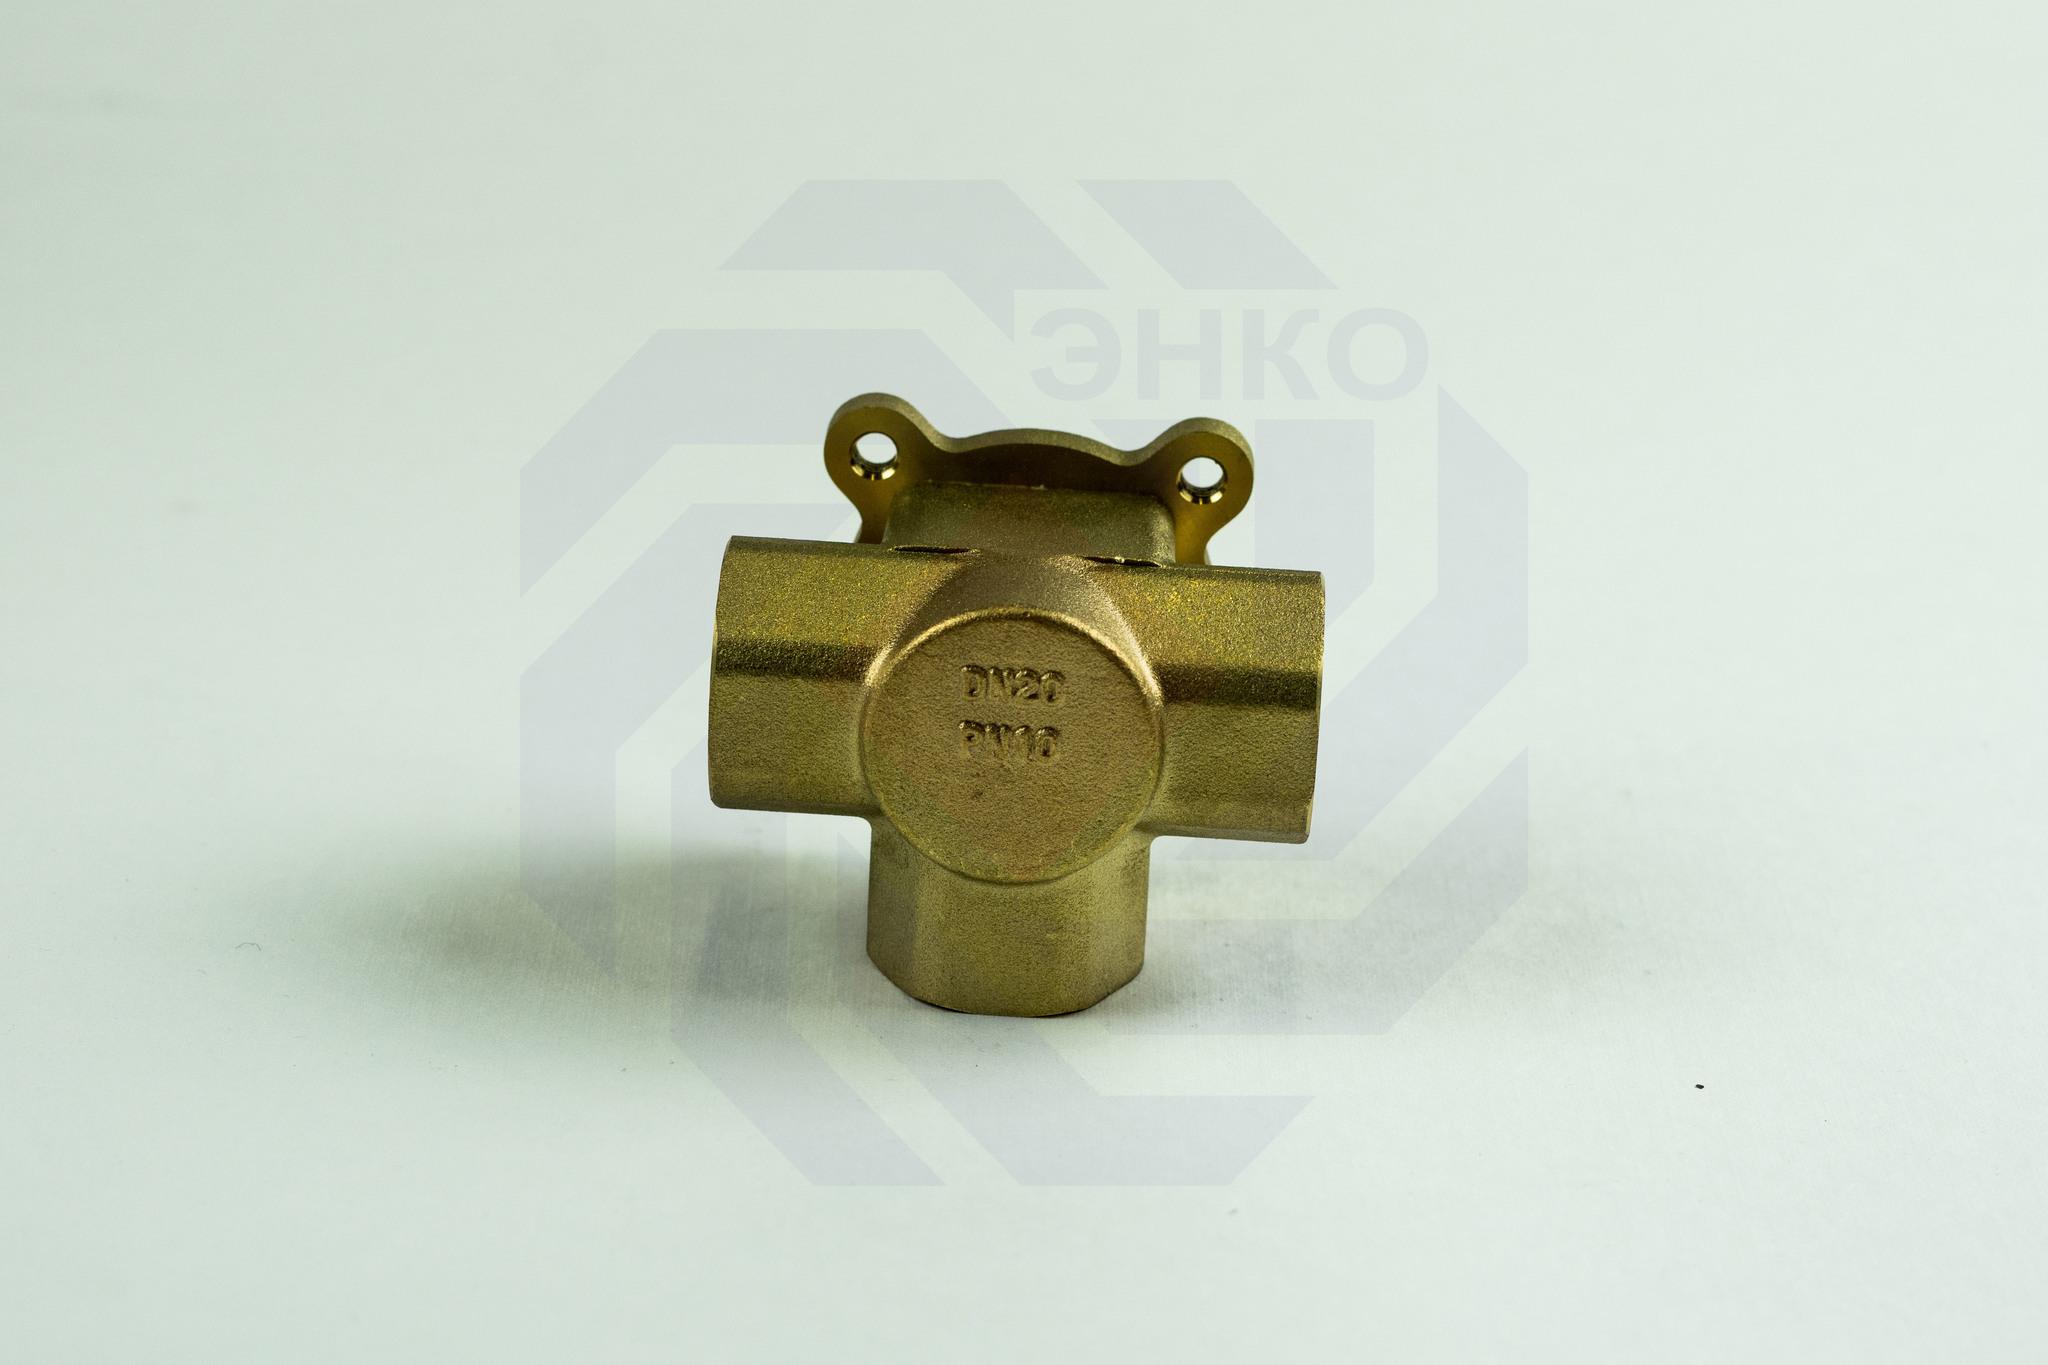 Клапан поворотный трехходовой GIACOMINI R297 ¾